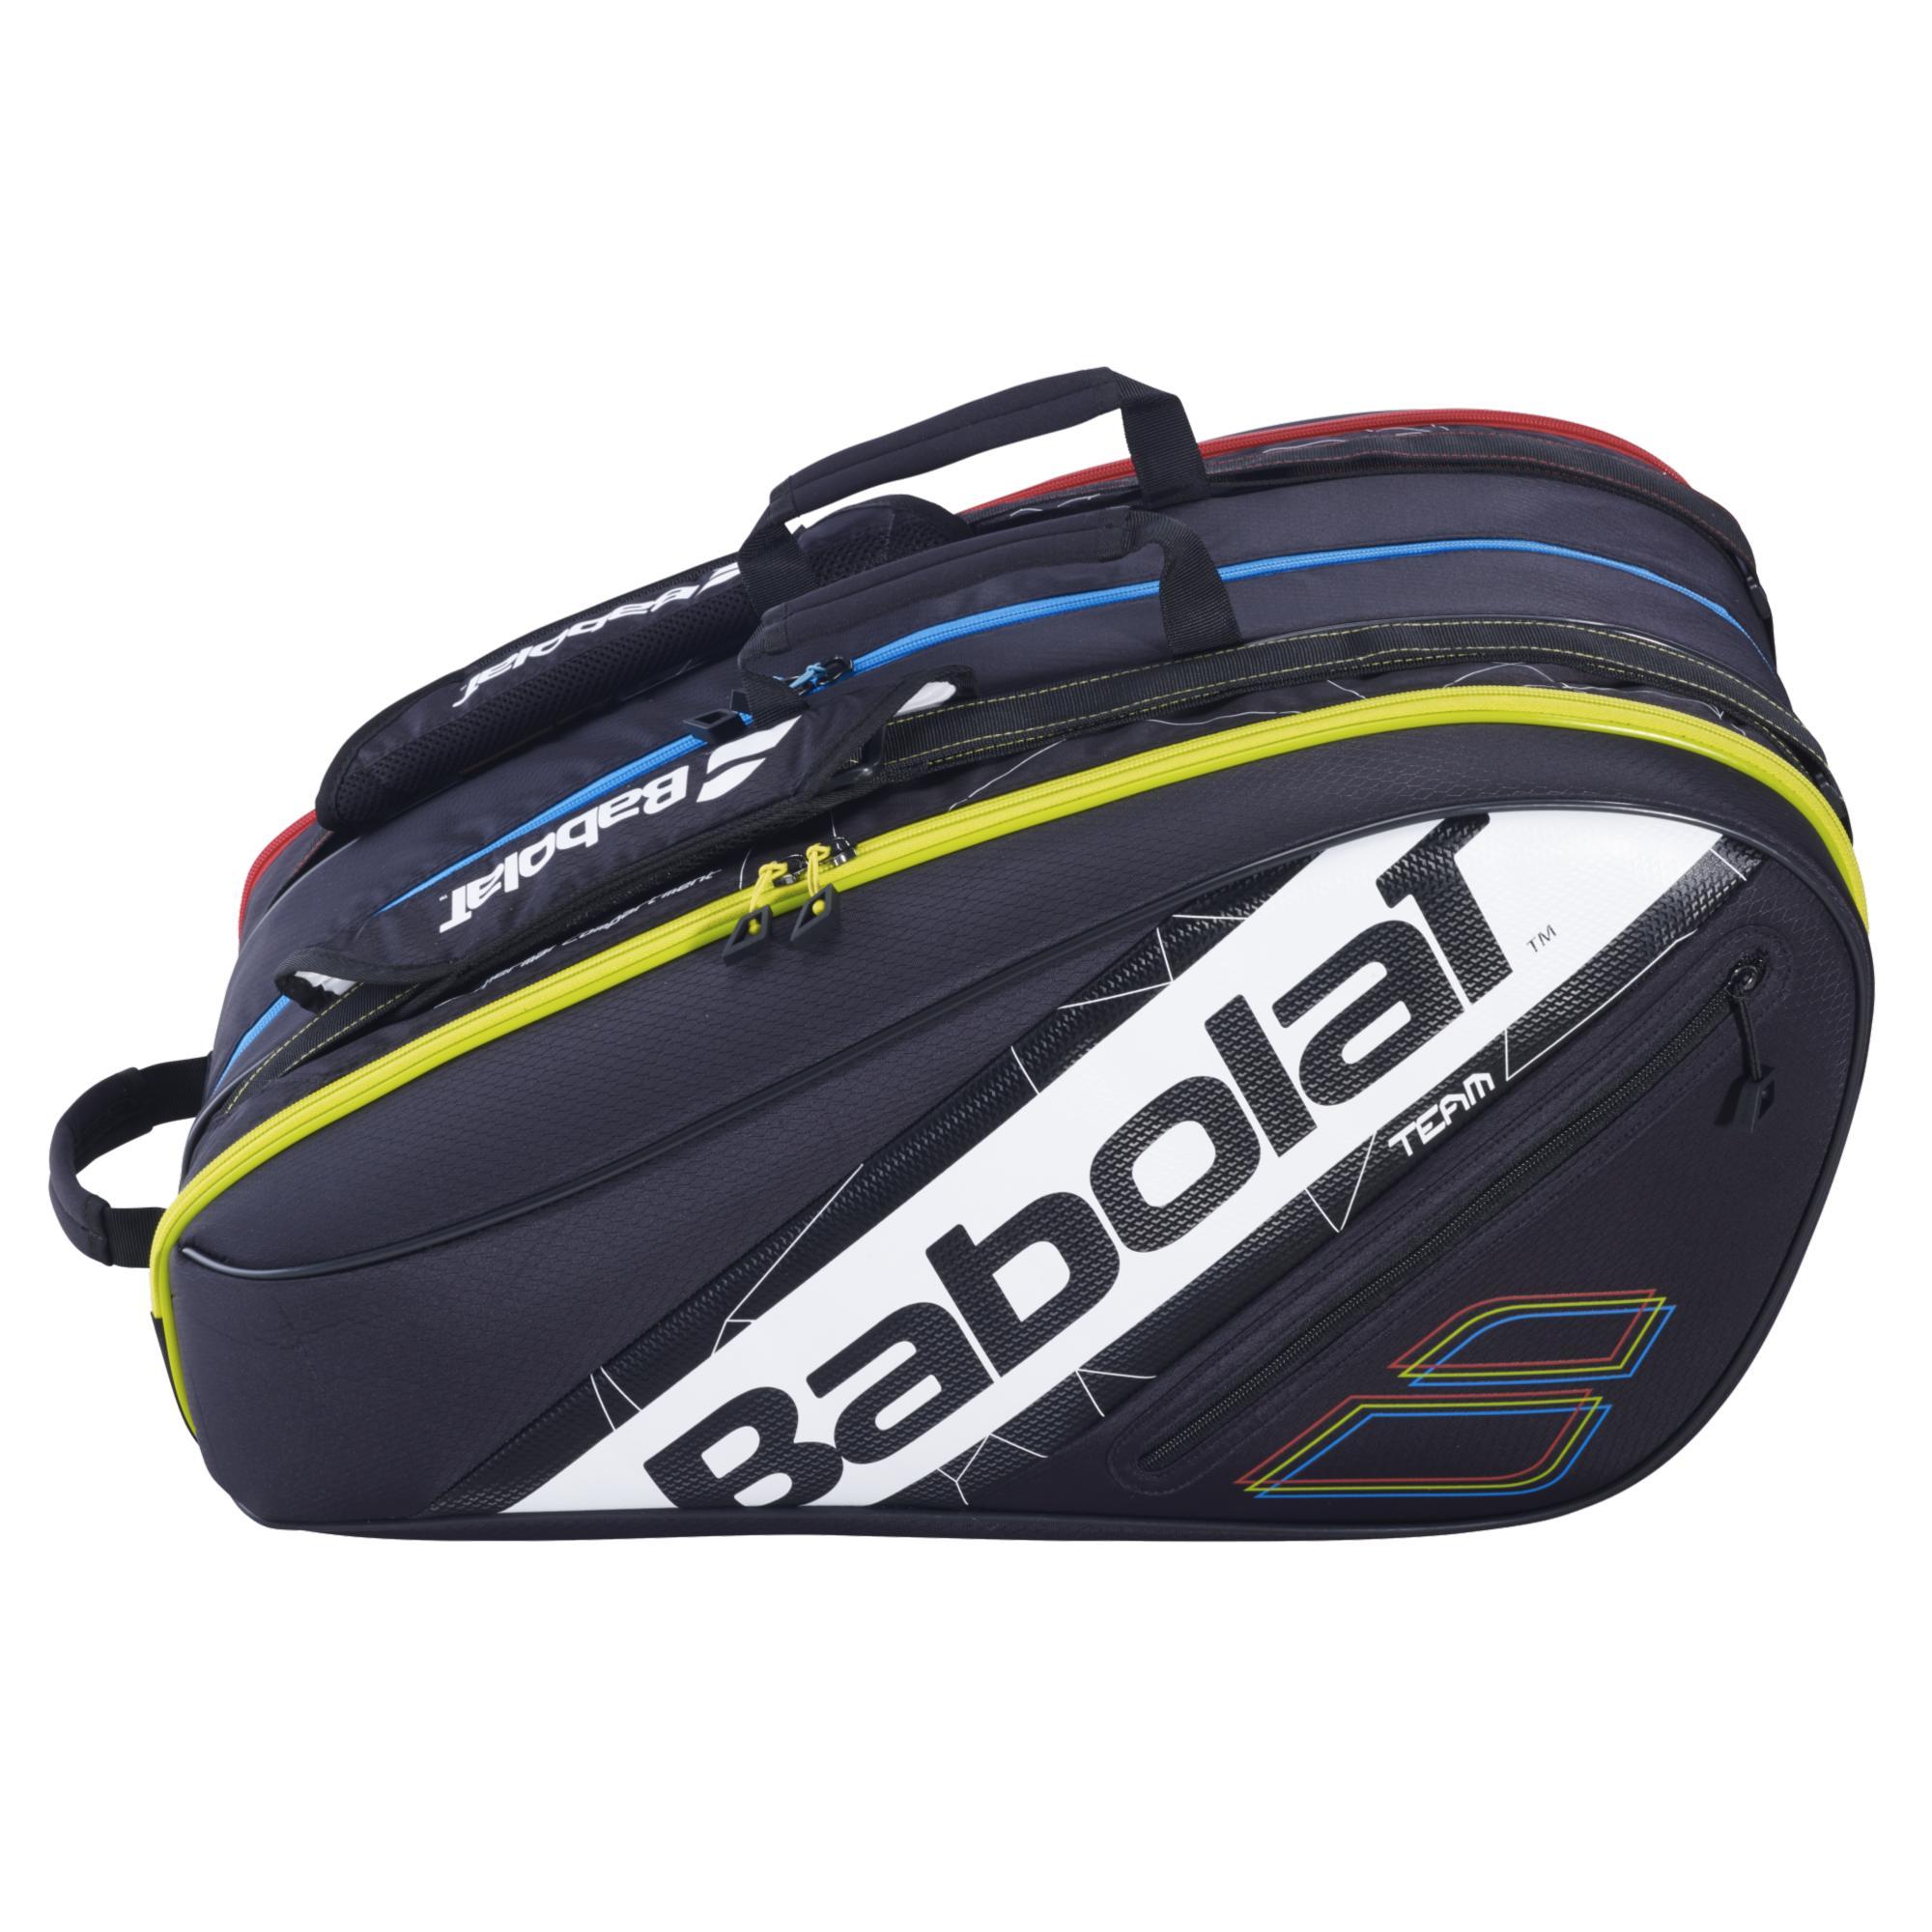 Babolat Rh team padel 759005-145 online kopen